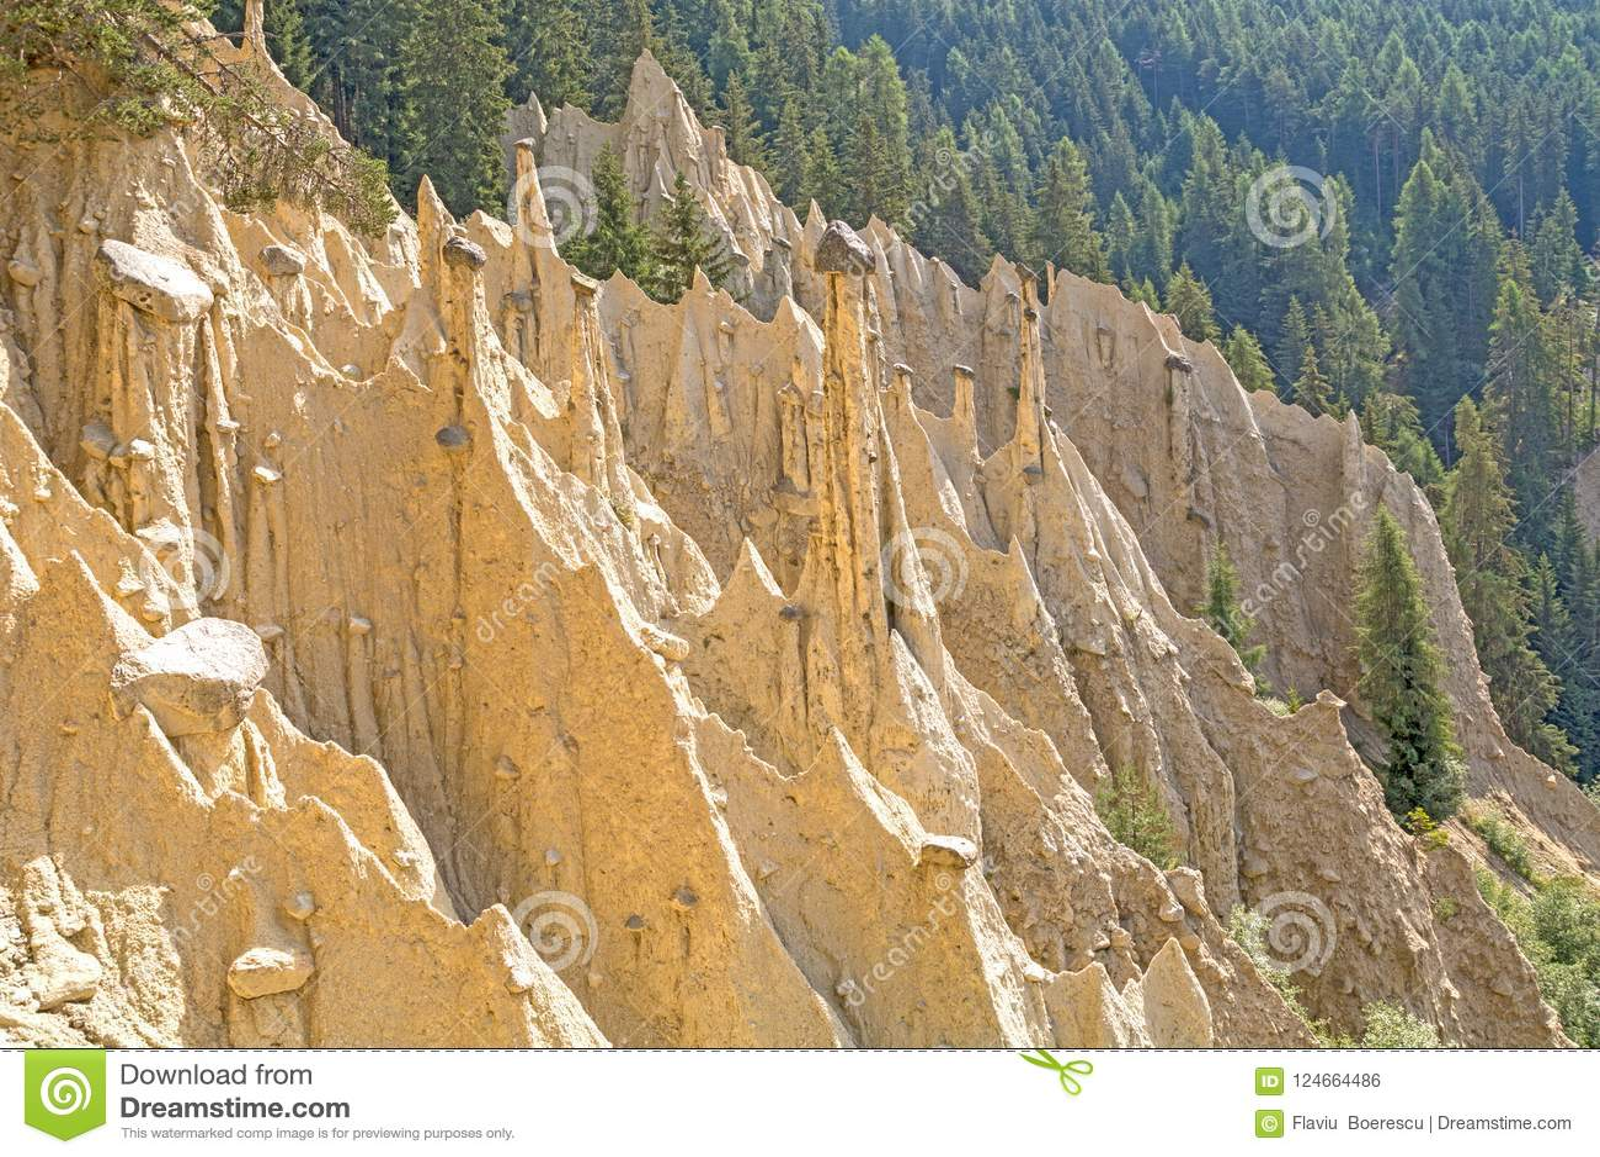 Natural Earth Pyramids stock photo  Image of phenomenon - 124664486